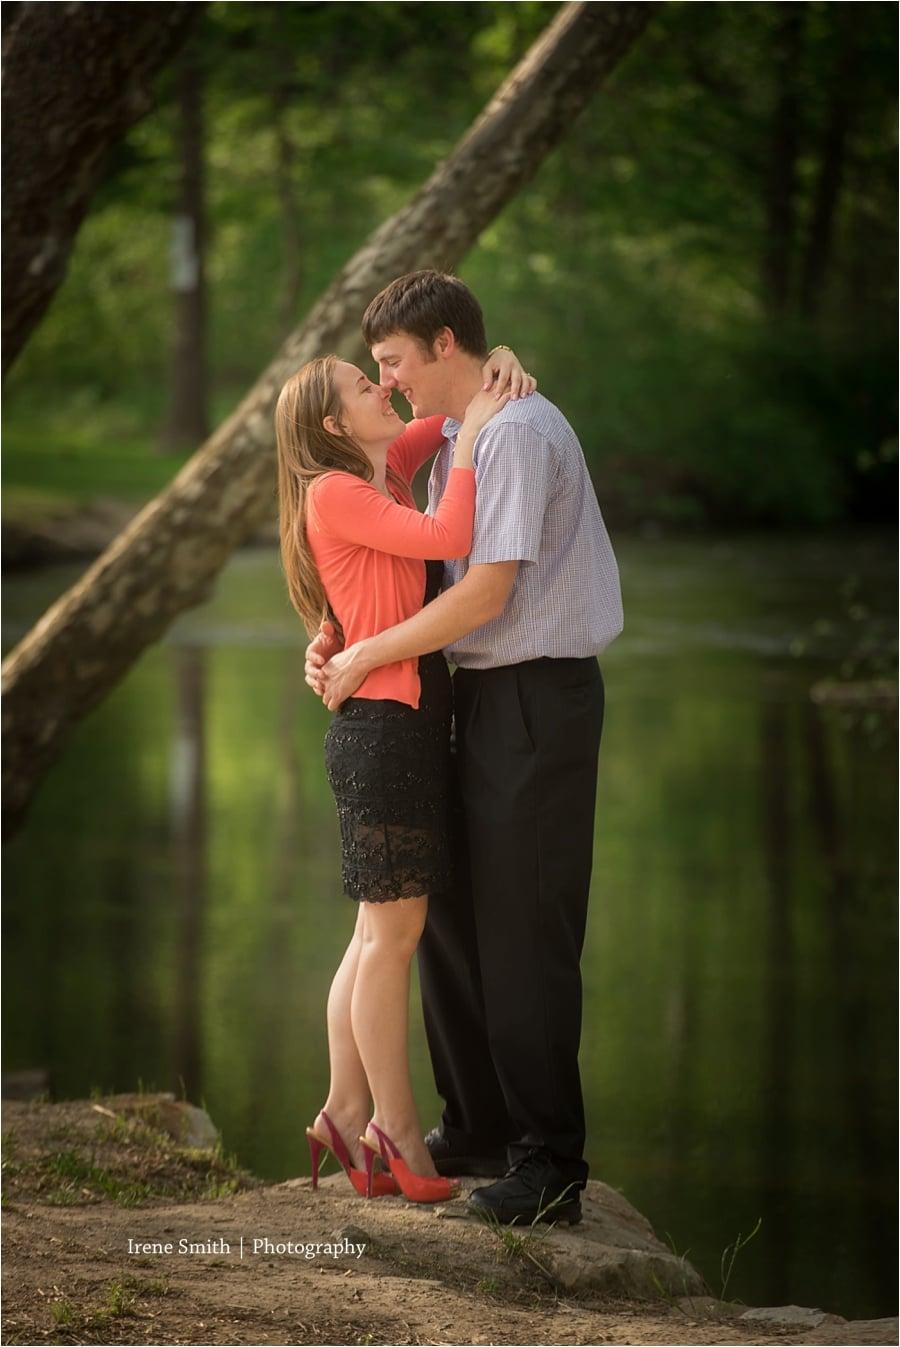 Irene-Smith-Photography-Meadville-Pennsylvania-Engagement-Woodcock-Dam_0012.jpg